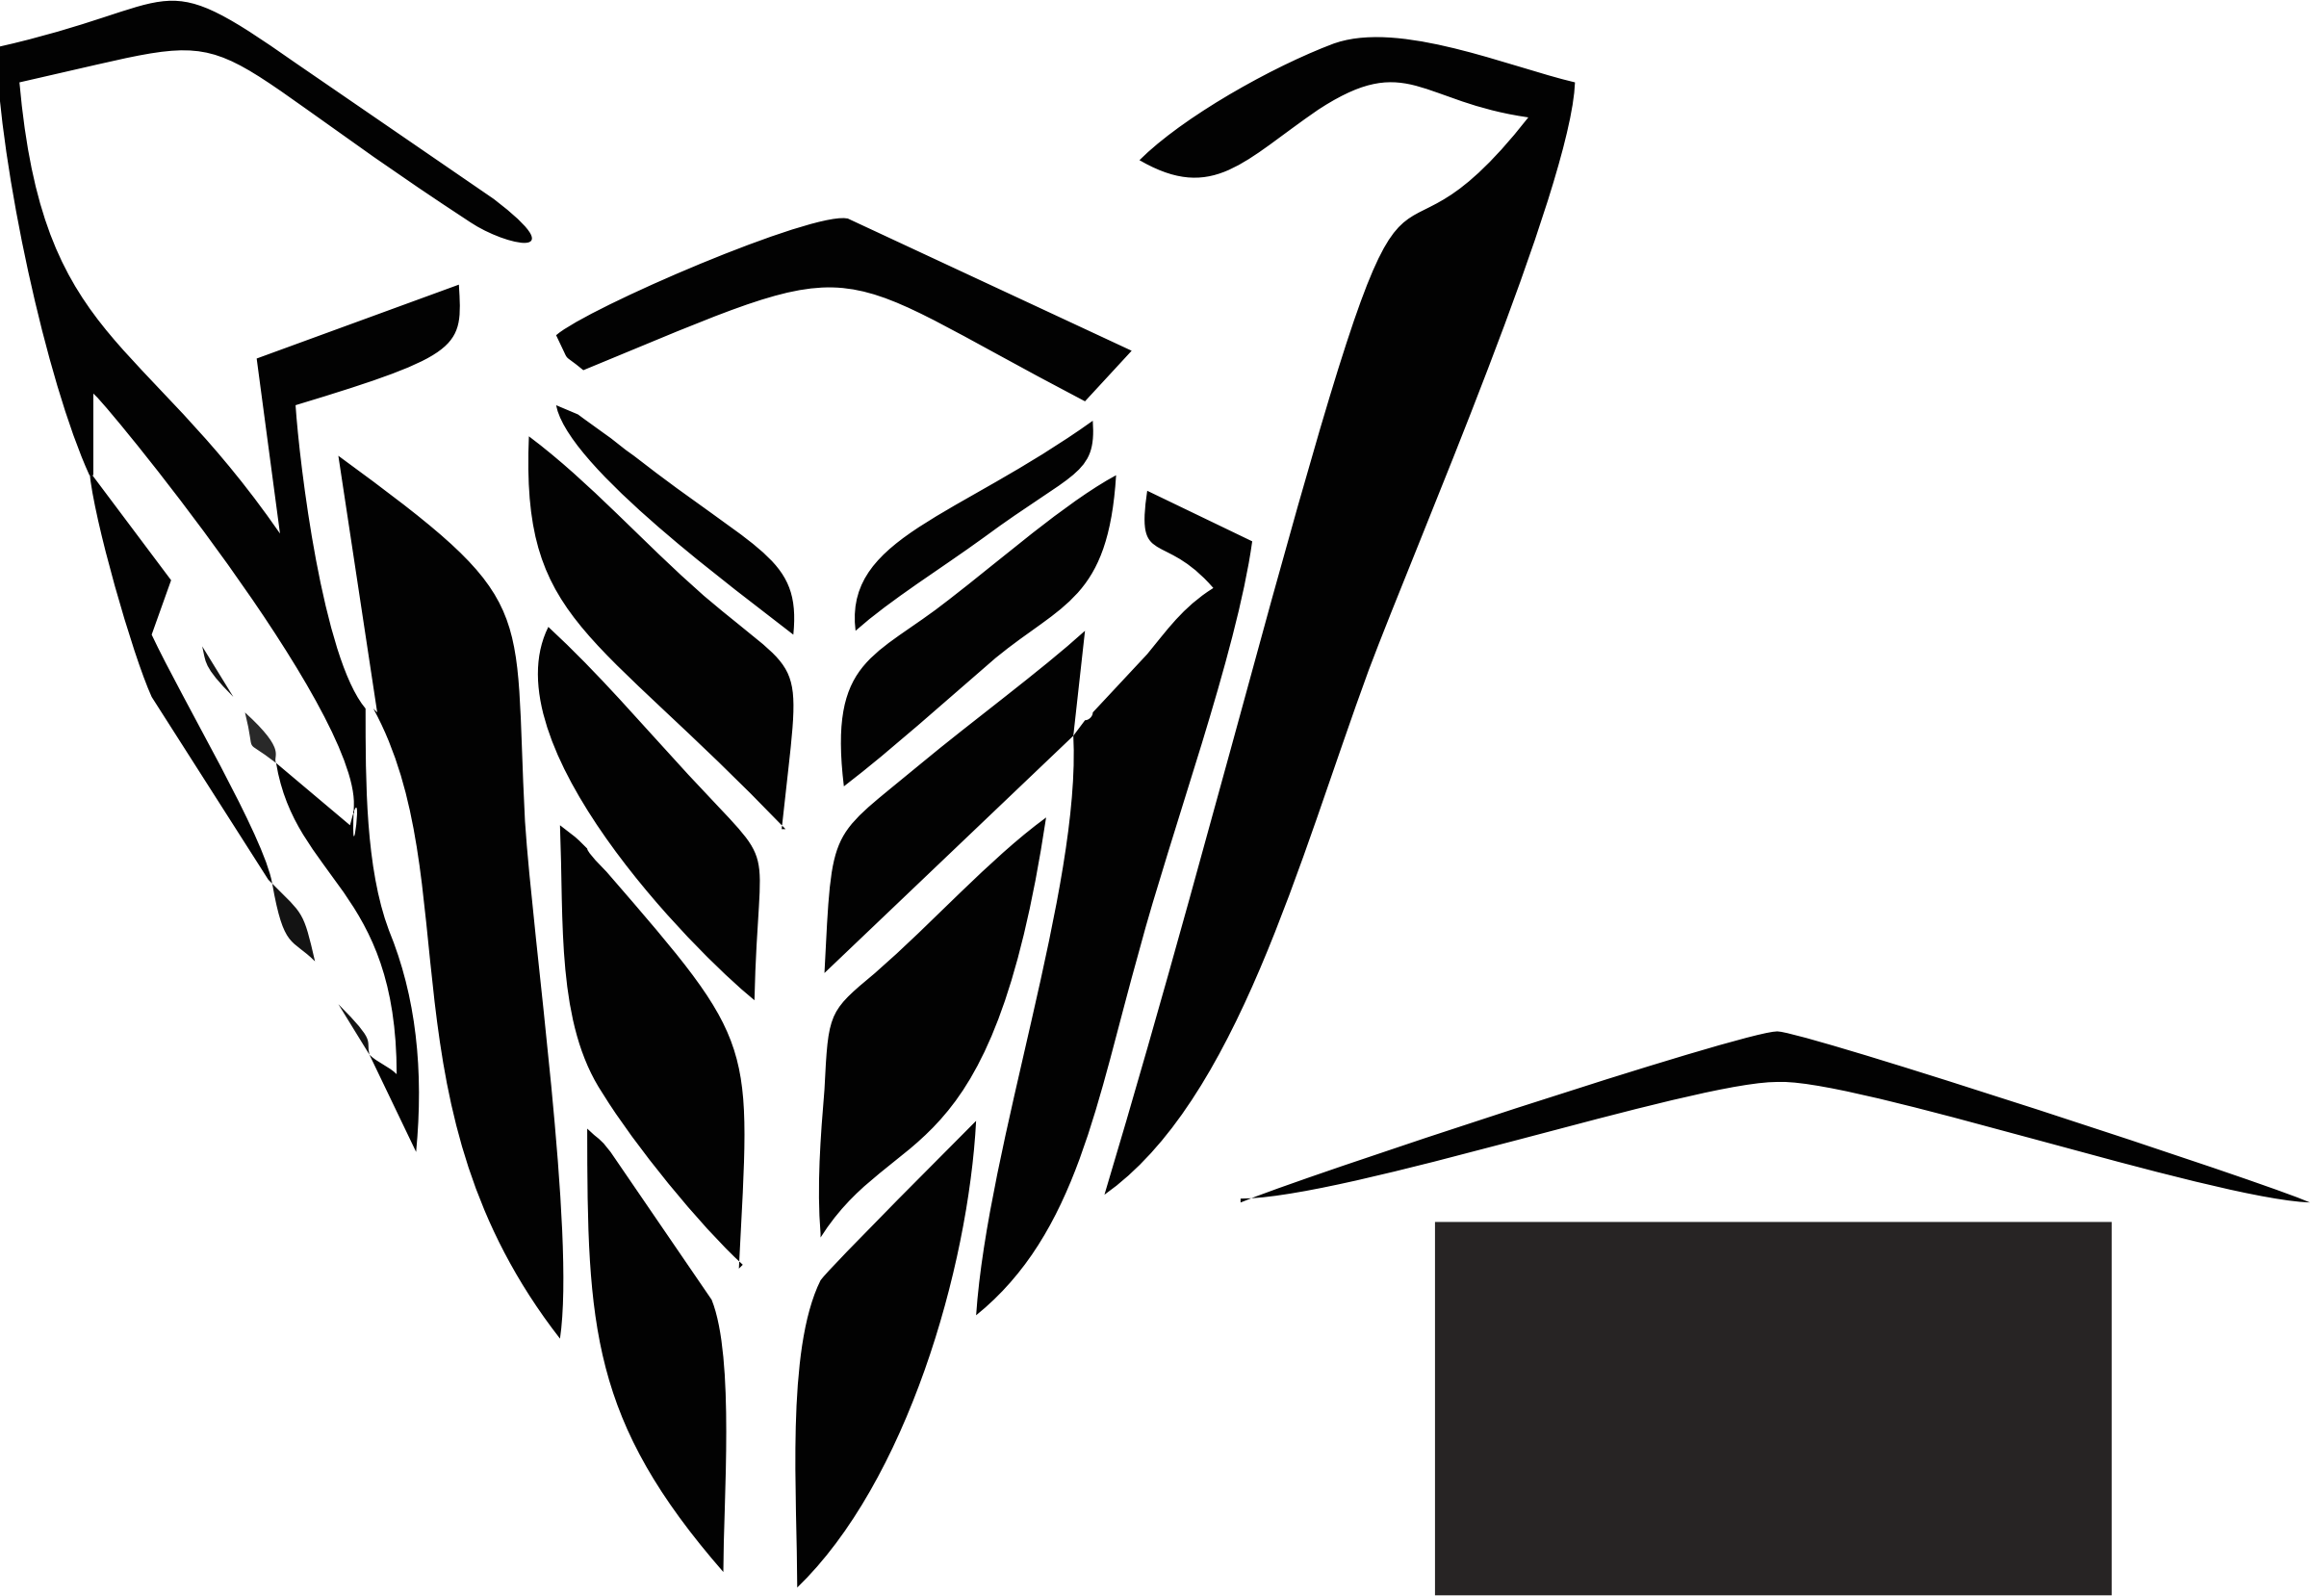 clipart bread logo